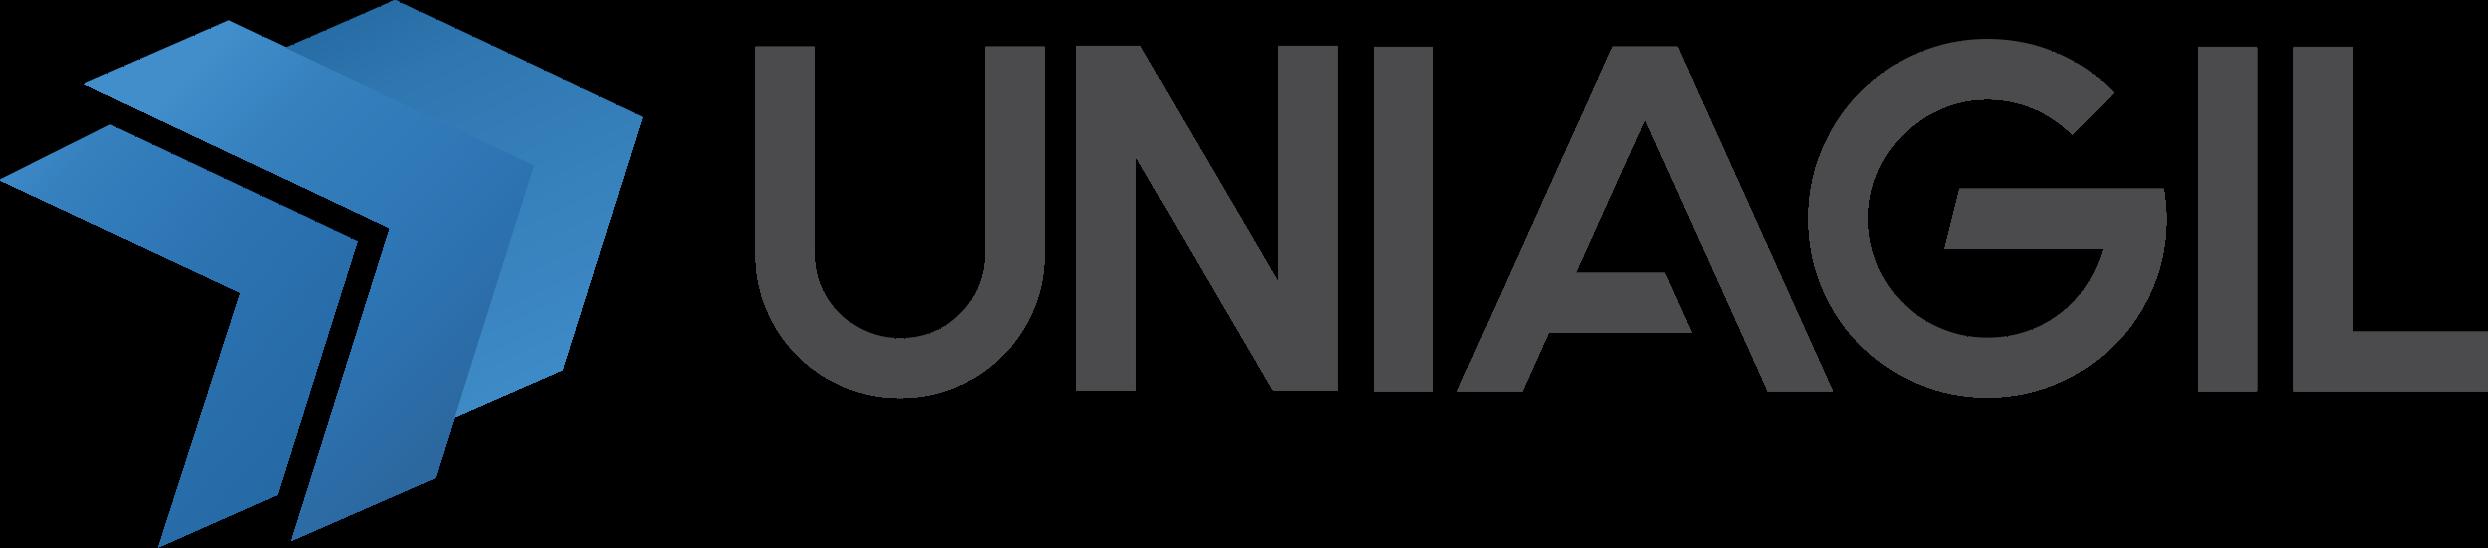 UNIAGIL – Universidade Ágil oficial